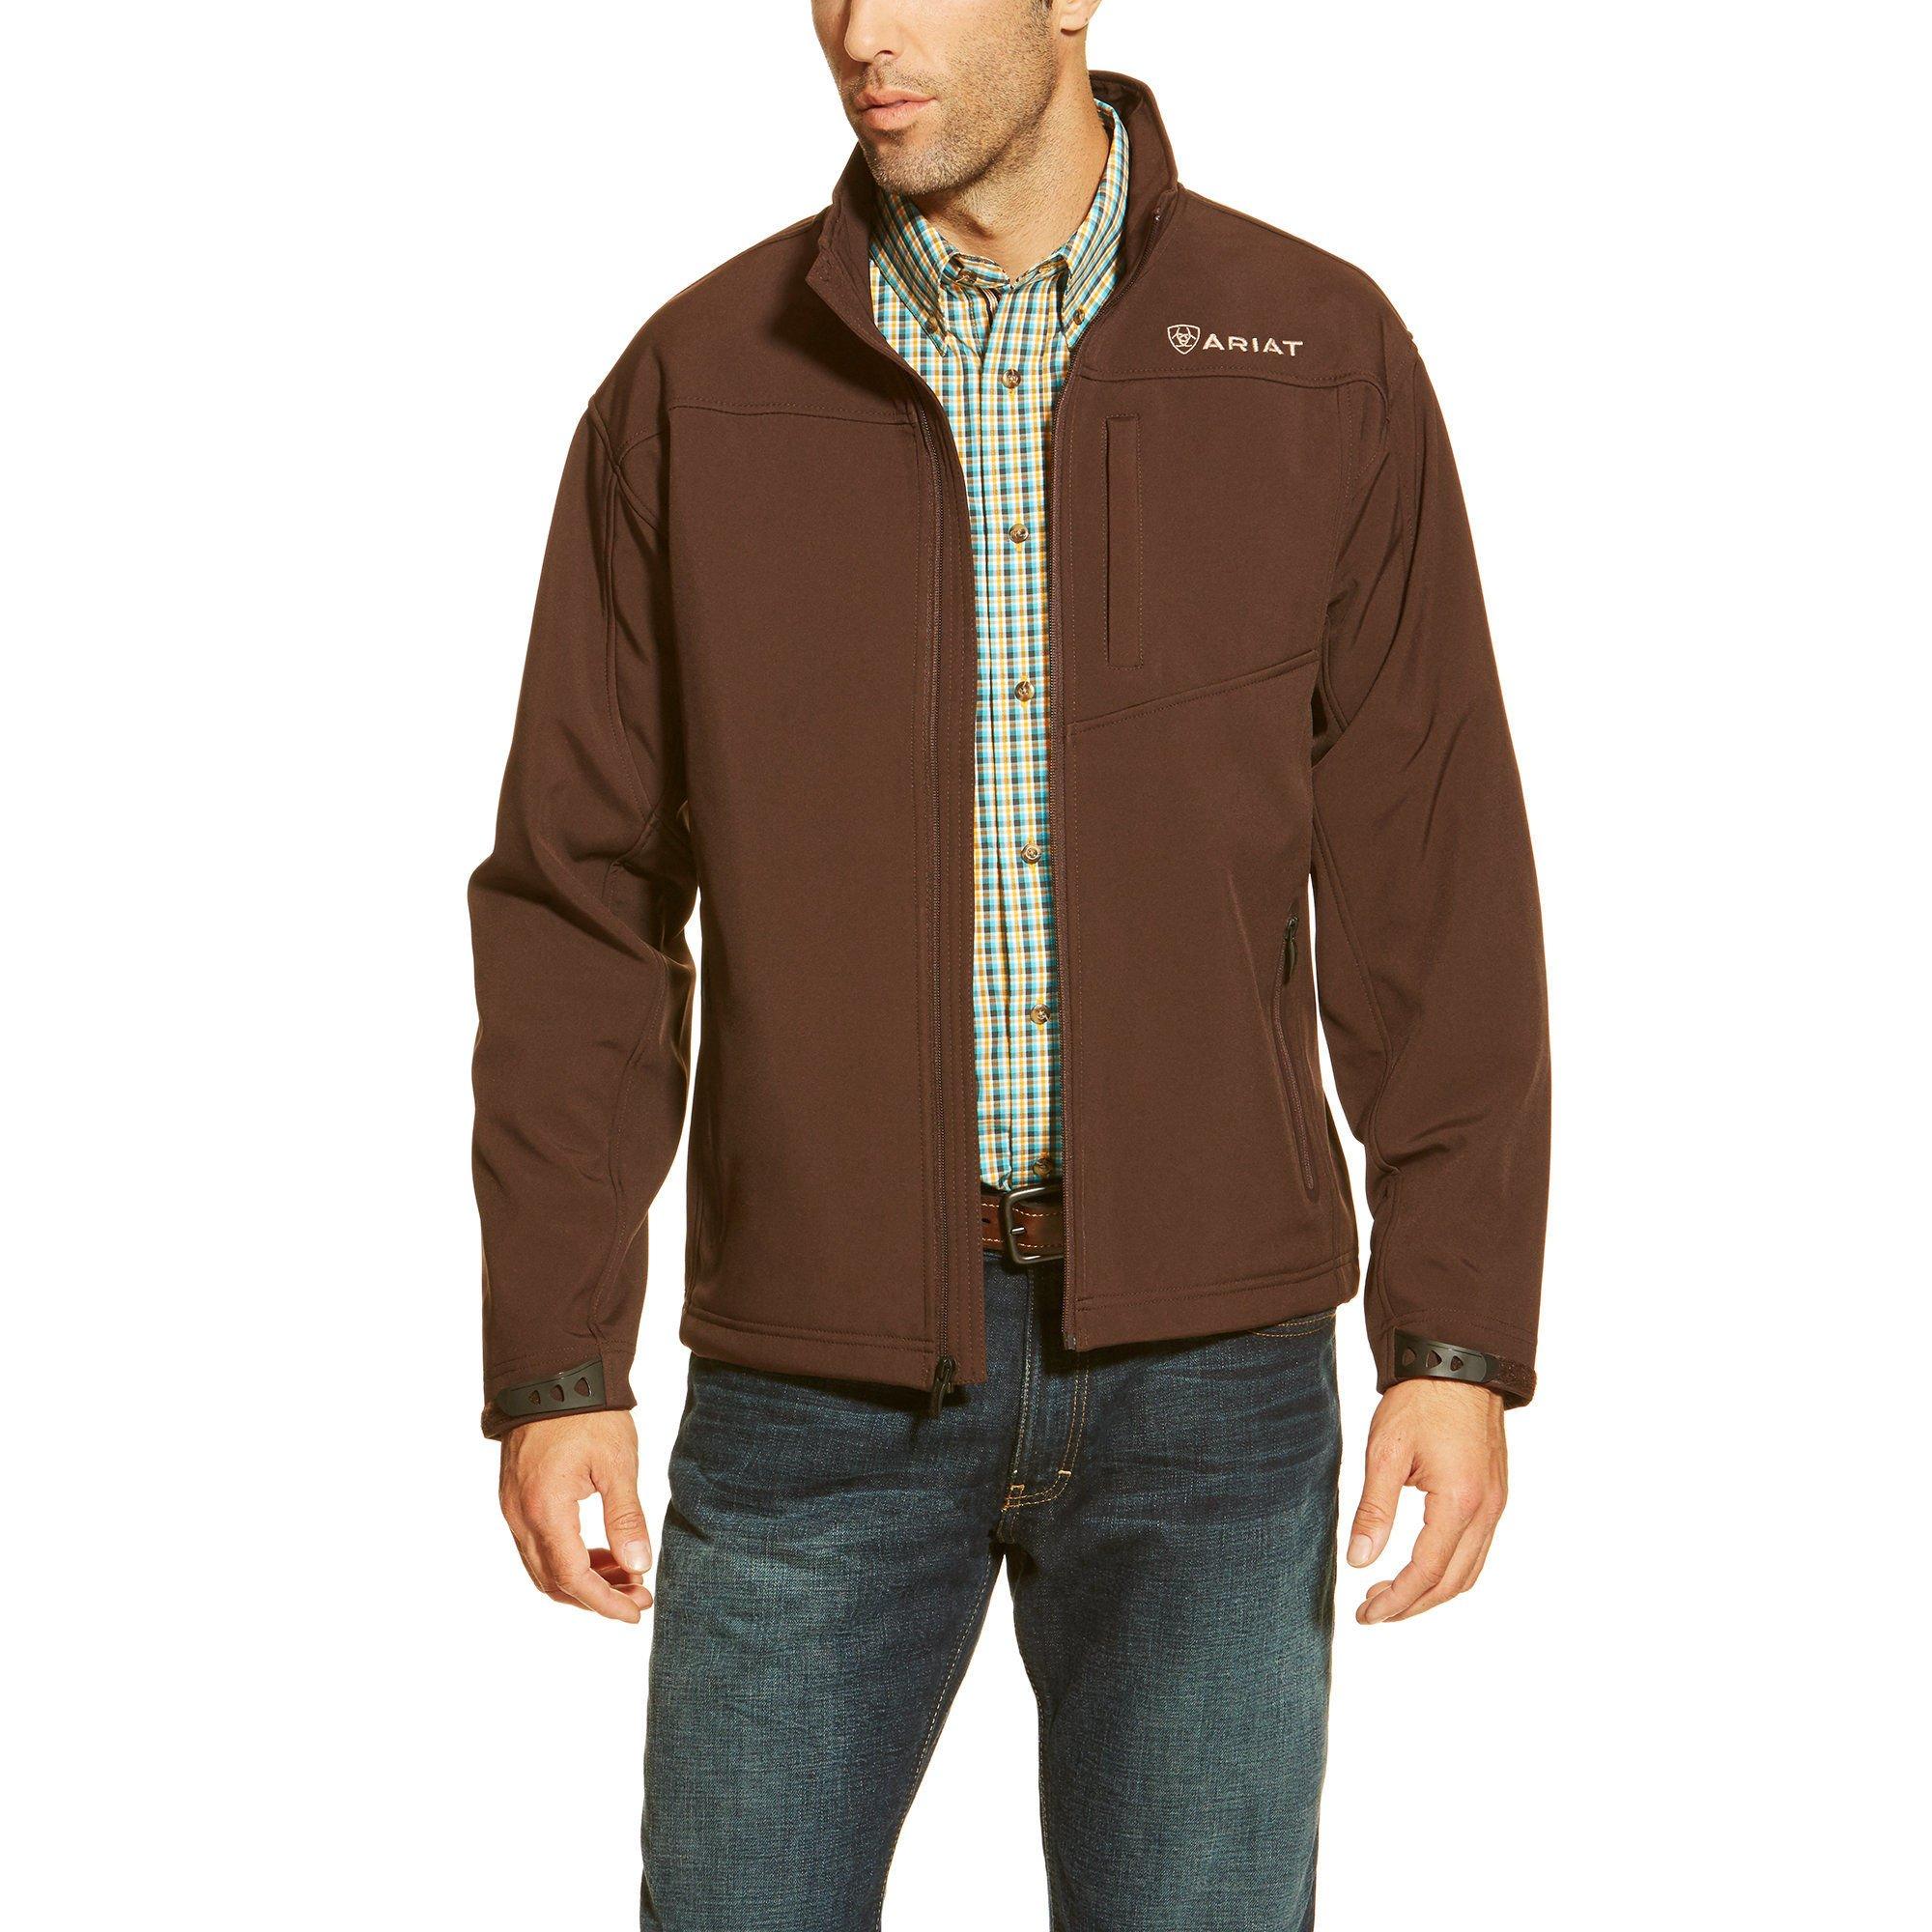 Ariat Men's Vernon Softshell Jacket, Coffee Bean, X-Large